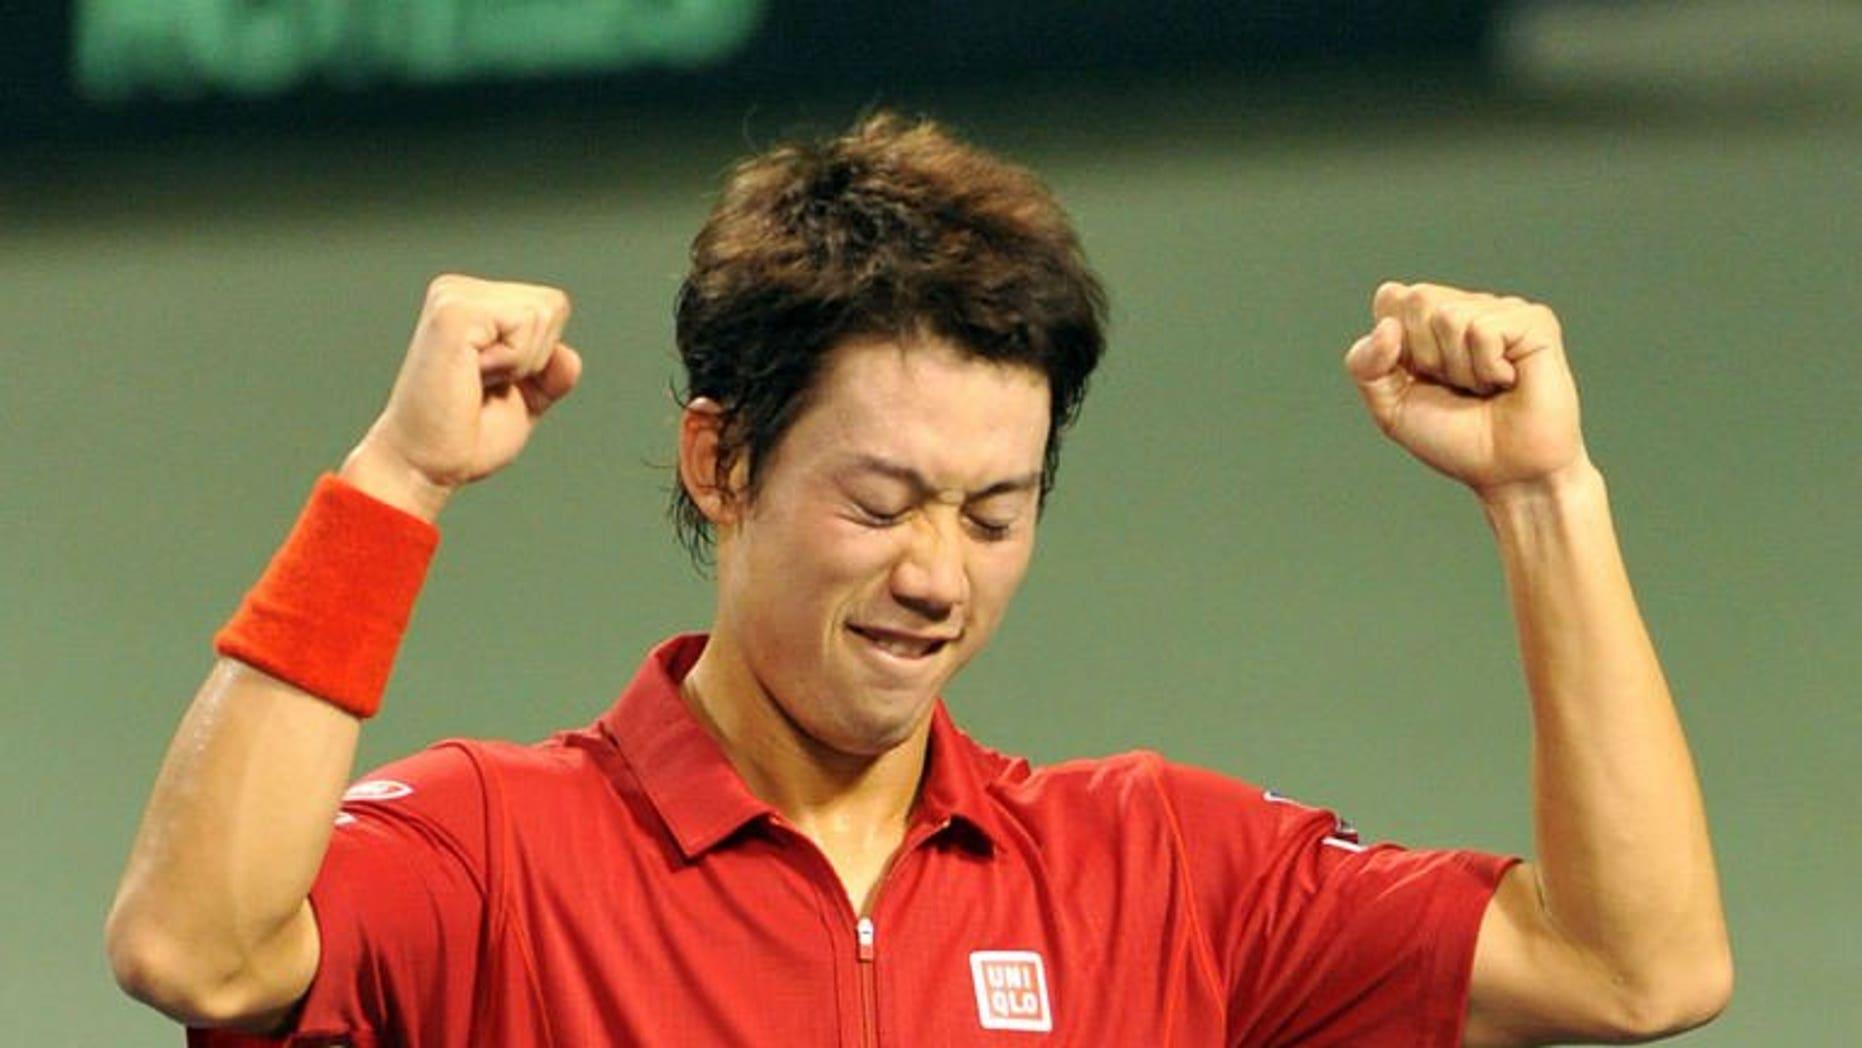 Japan's Kei Nishikori celebrates his win over Santiago Giraldo of Colombia after their Davis Cup World Group play-off in Tokyo on September 15, 2013. Nishikori beat Giraldo 6-1, 6-2, 6-4, propelling Japan back into the Davis Cup world group.